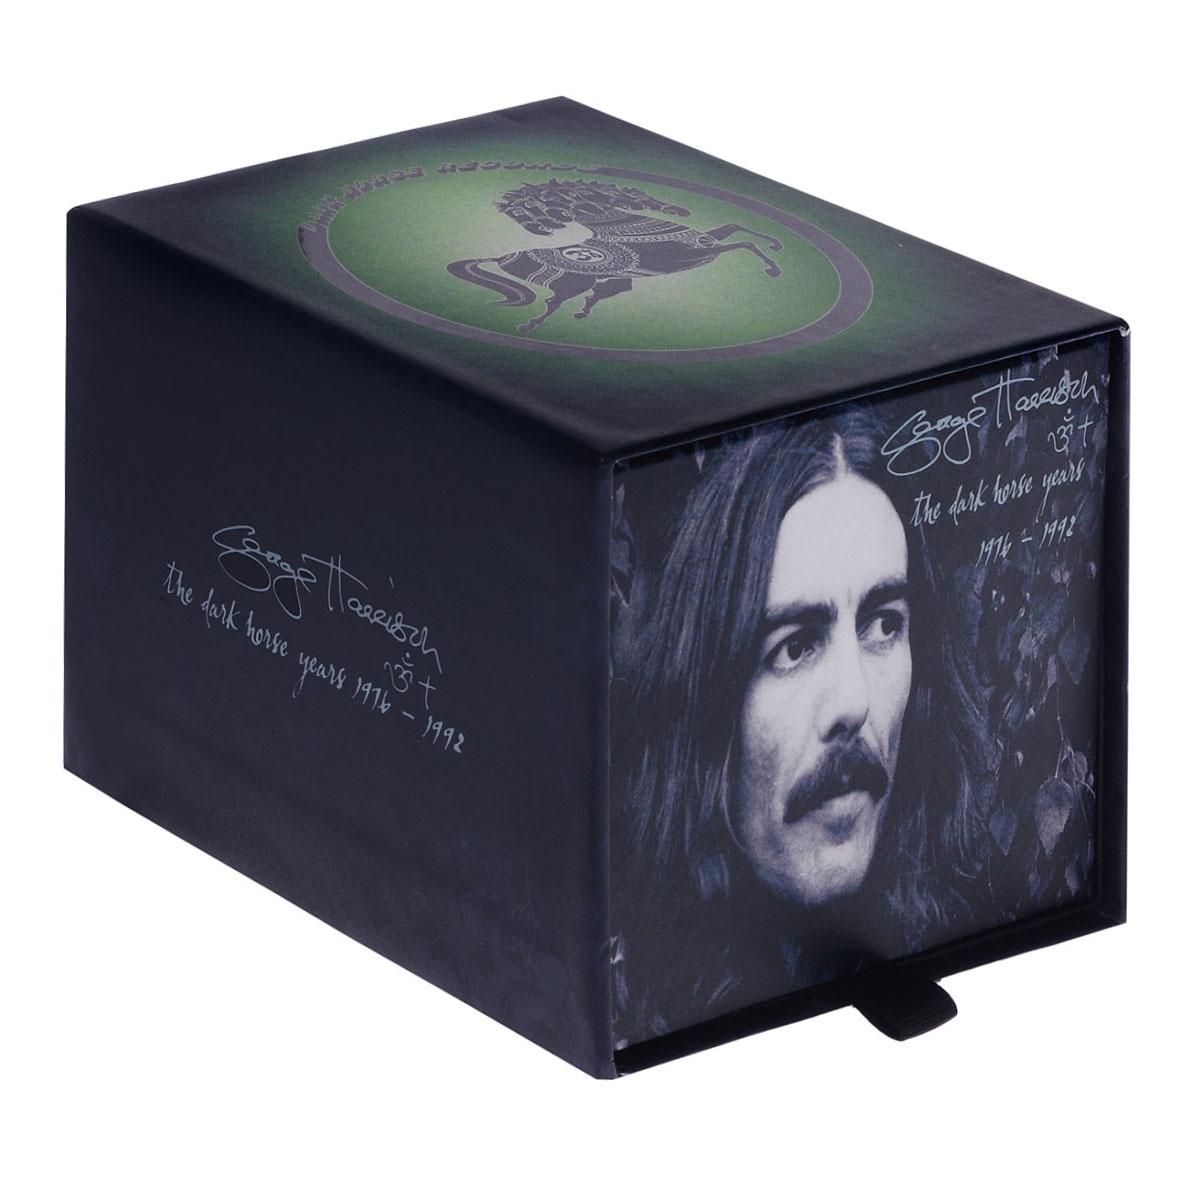 George Harrison. The Dark Horse Years 1976-1992 (5 CD + 2 SACD + DVD) 2004 8 Audio CD